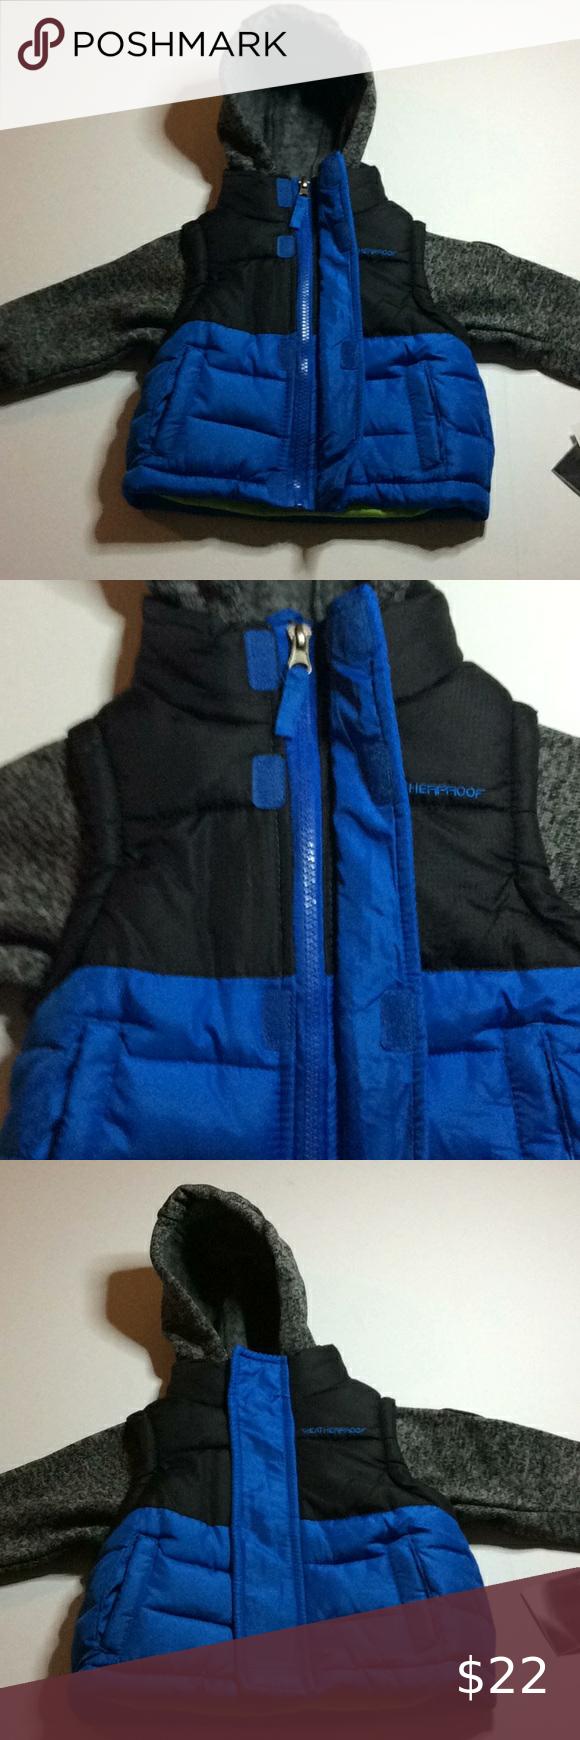 Nwt Weatherproof 12m Royal Blue Black Jacket In 2021 Girls Puffer Coat Girls Winter Coats Toddler Winter Jackets [ 1740 x 580 Pixel ]